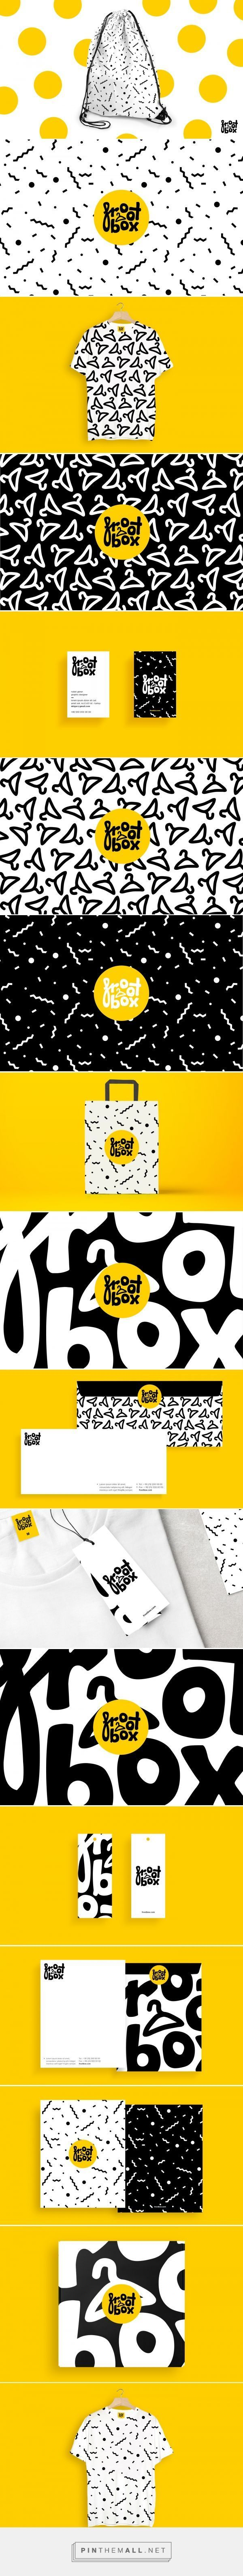 Branding | Graphic Design | Packaging Design | Frootbox Branding by Nuket Guner Corlan